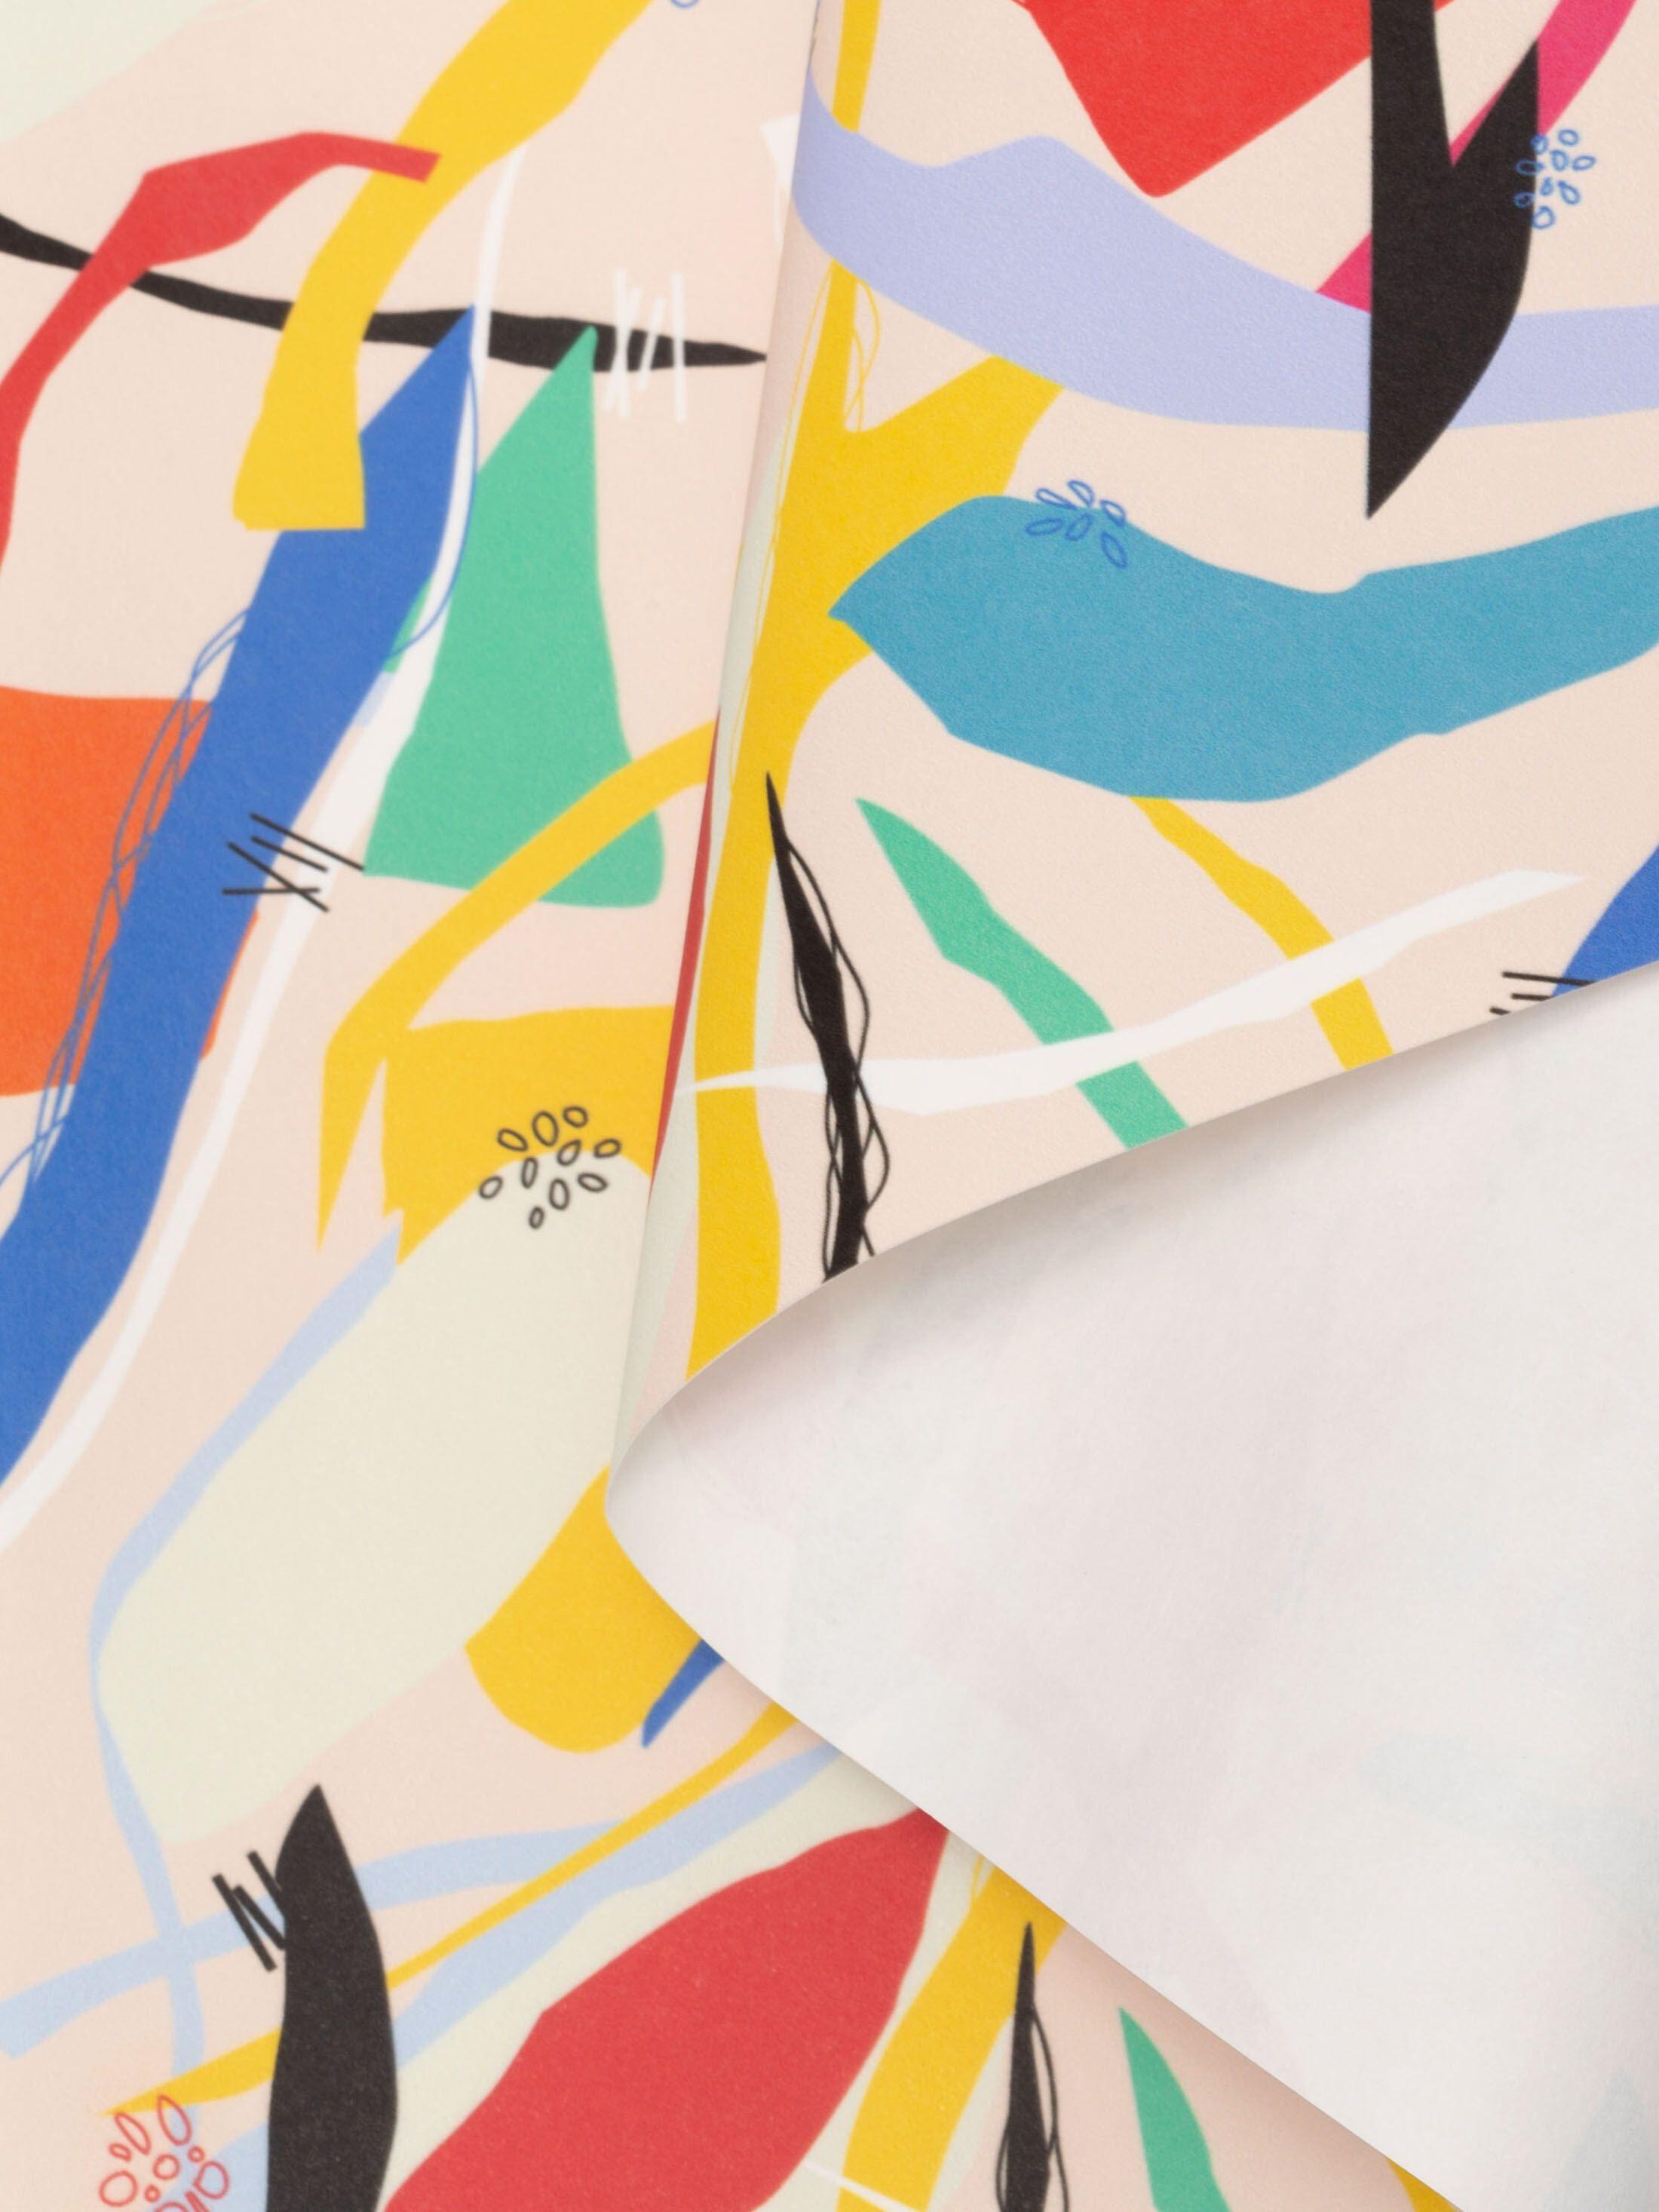 scroll papier stoff bedrucken lassen eigenes design